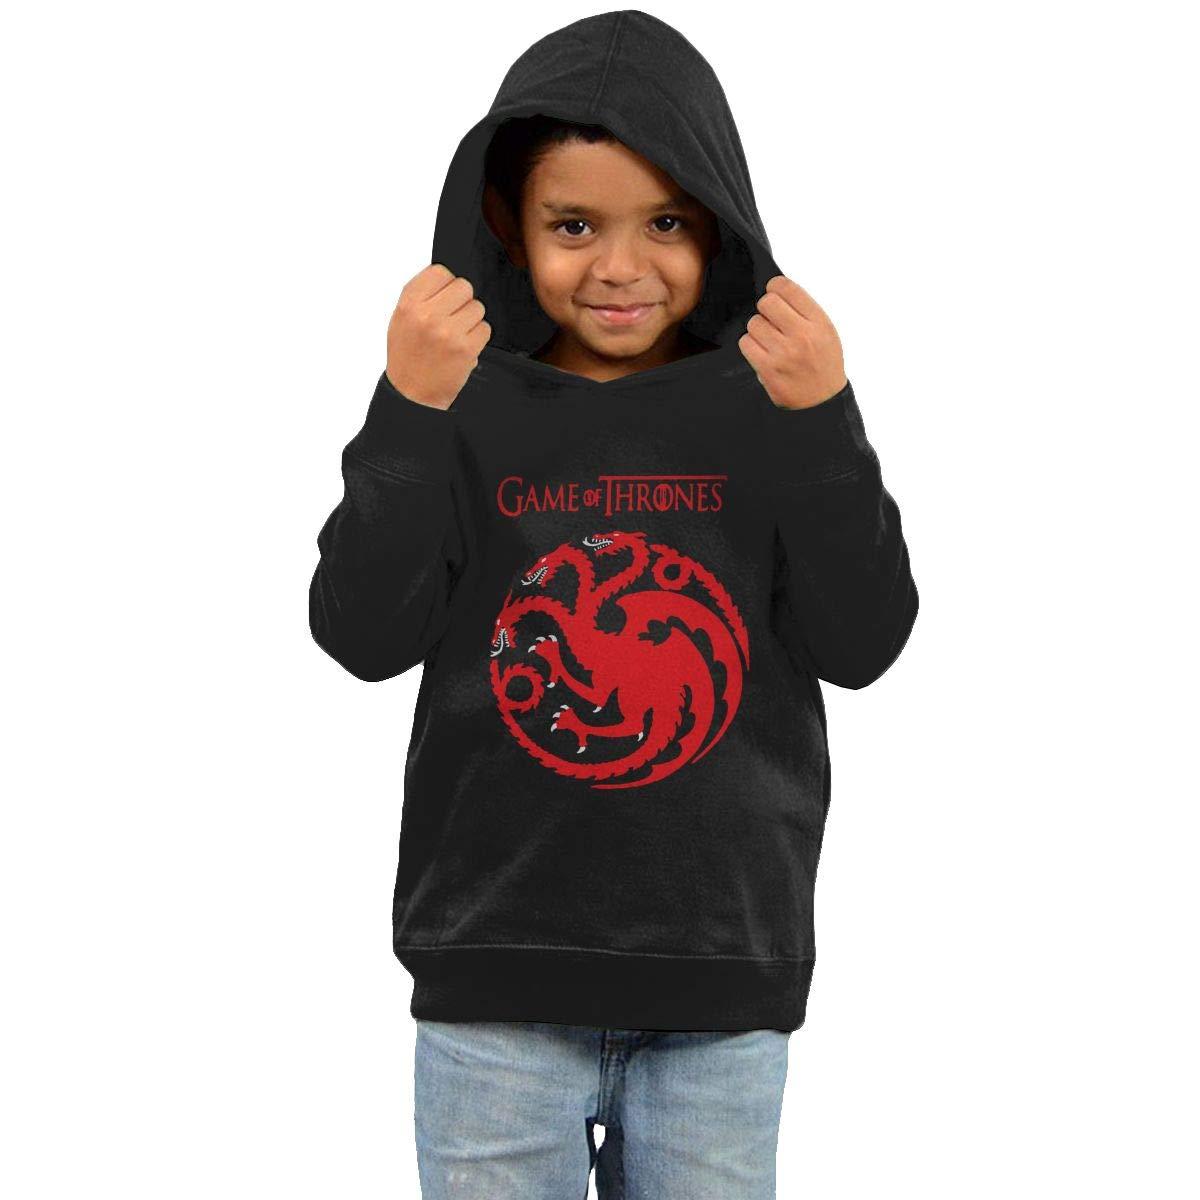 Stacy J. Payne Toddler Game Targaryen Casual Style Fleece40 Black